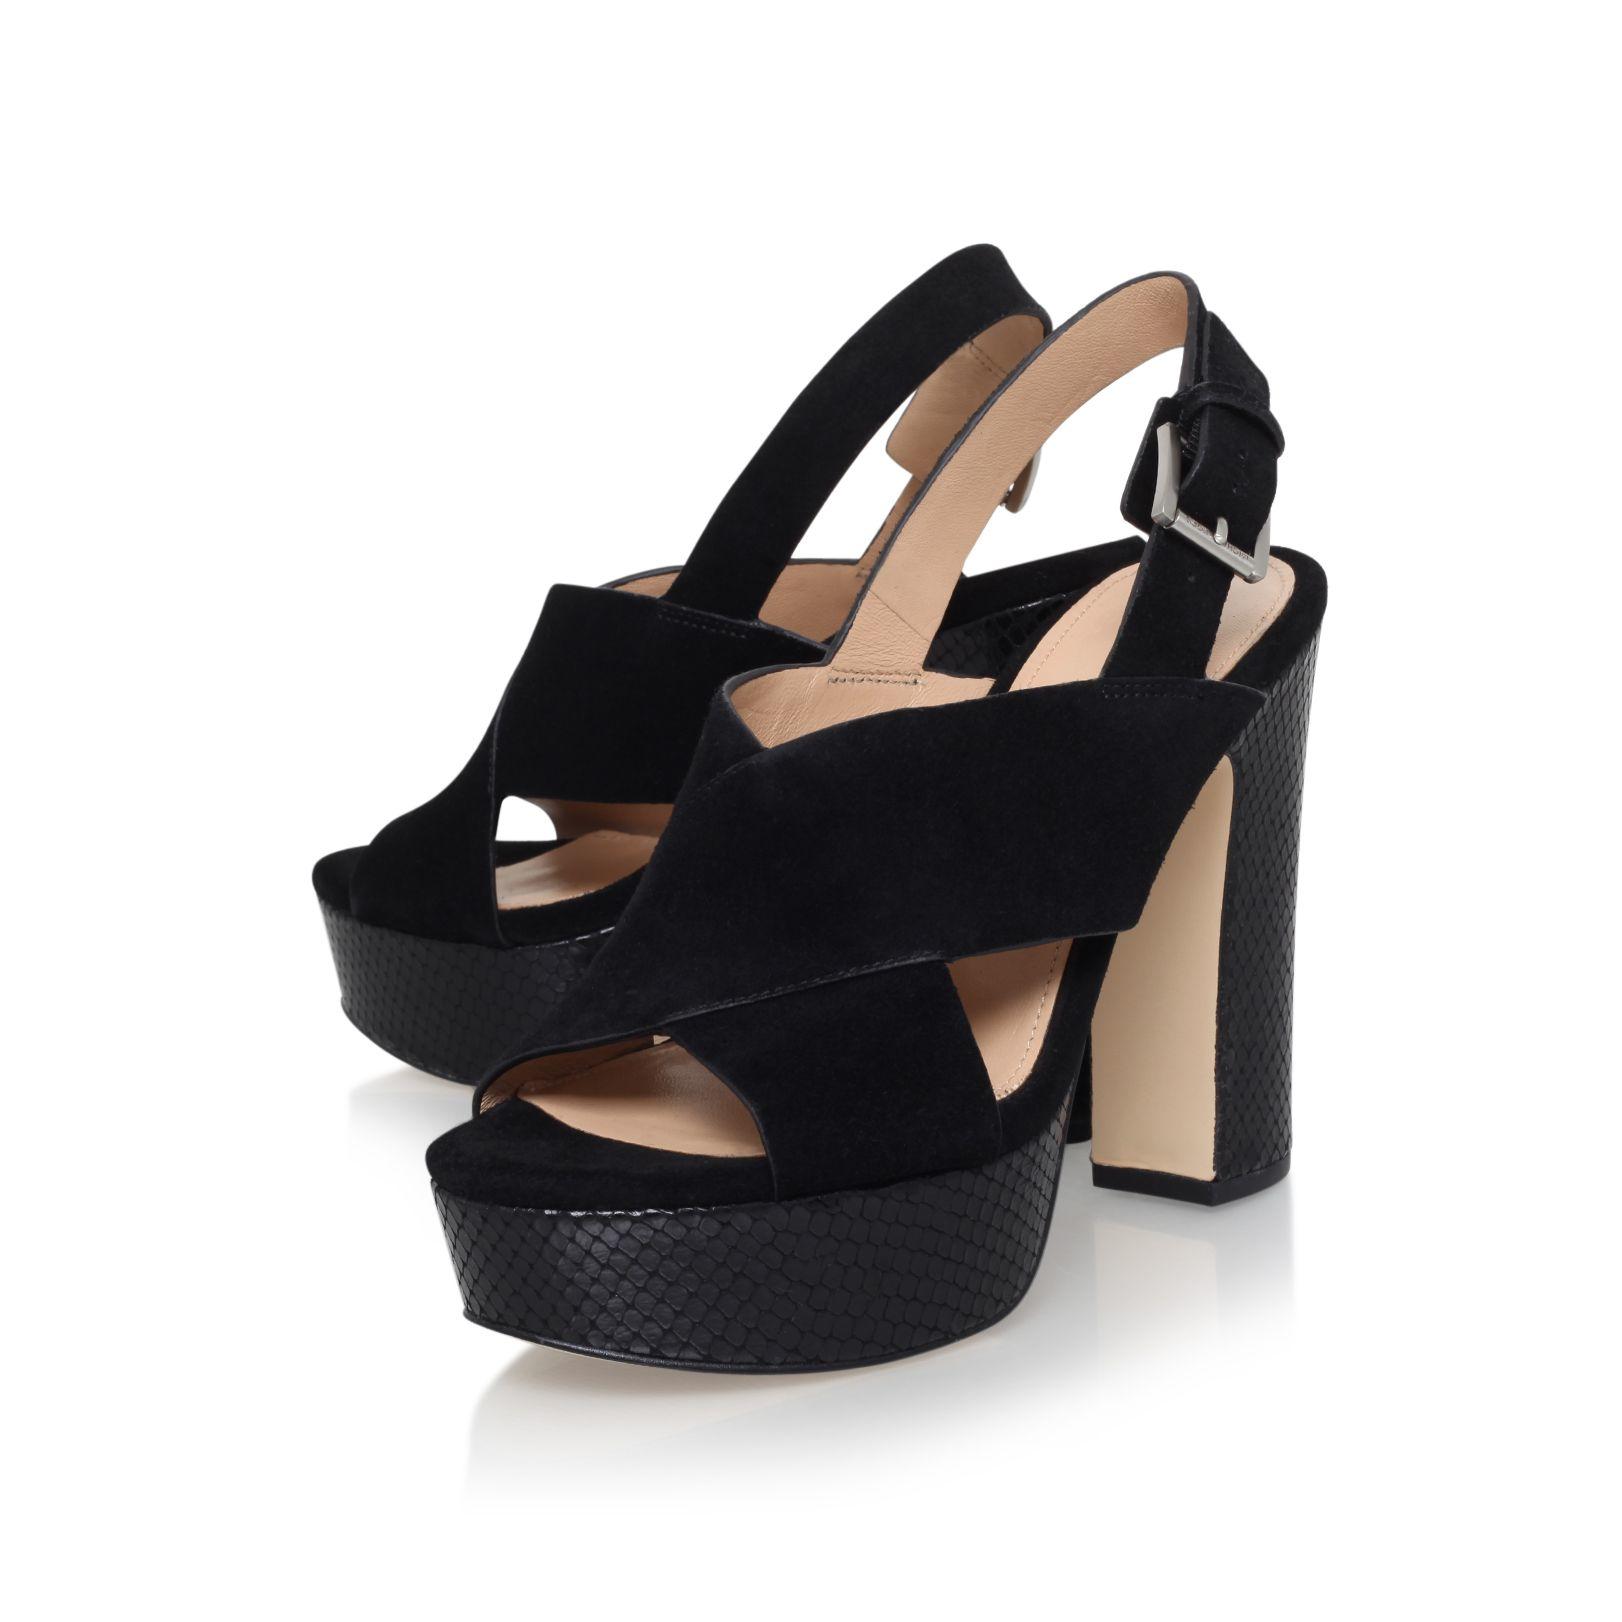 Michael Kors Mariana High Heel Slingback Sandals In Black